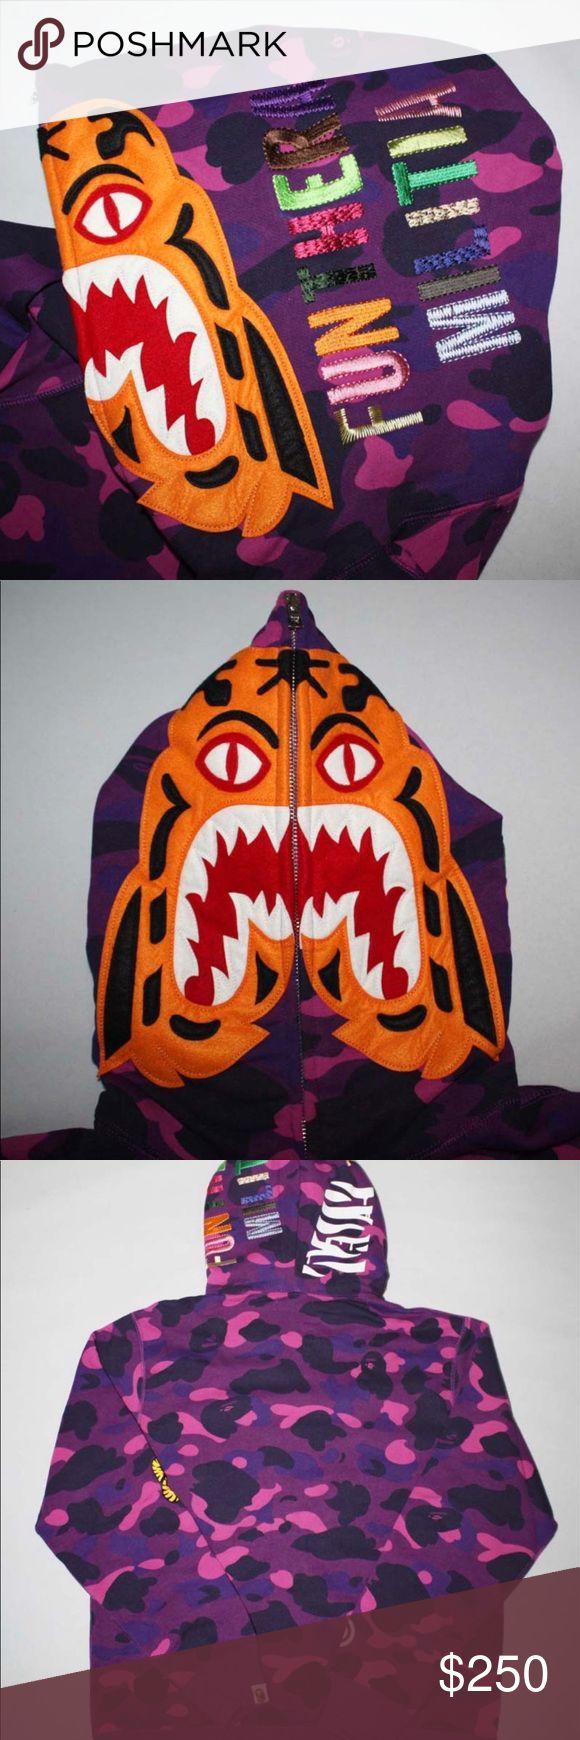 Bape purple camo tiger hoodie size large Worn 2x. Still like new. Comes with bag. Size large. Need cash no lowballs plz. Bape Shirts Sweatshirts & Hoodies